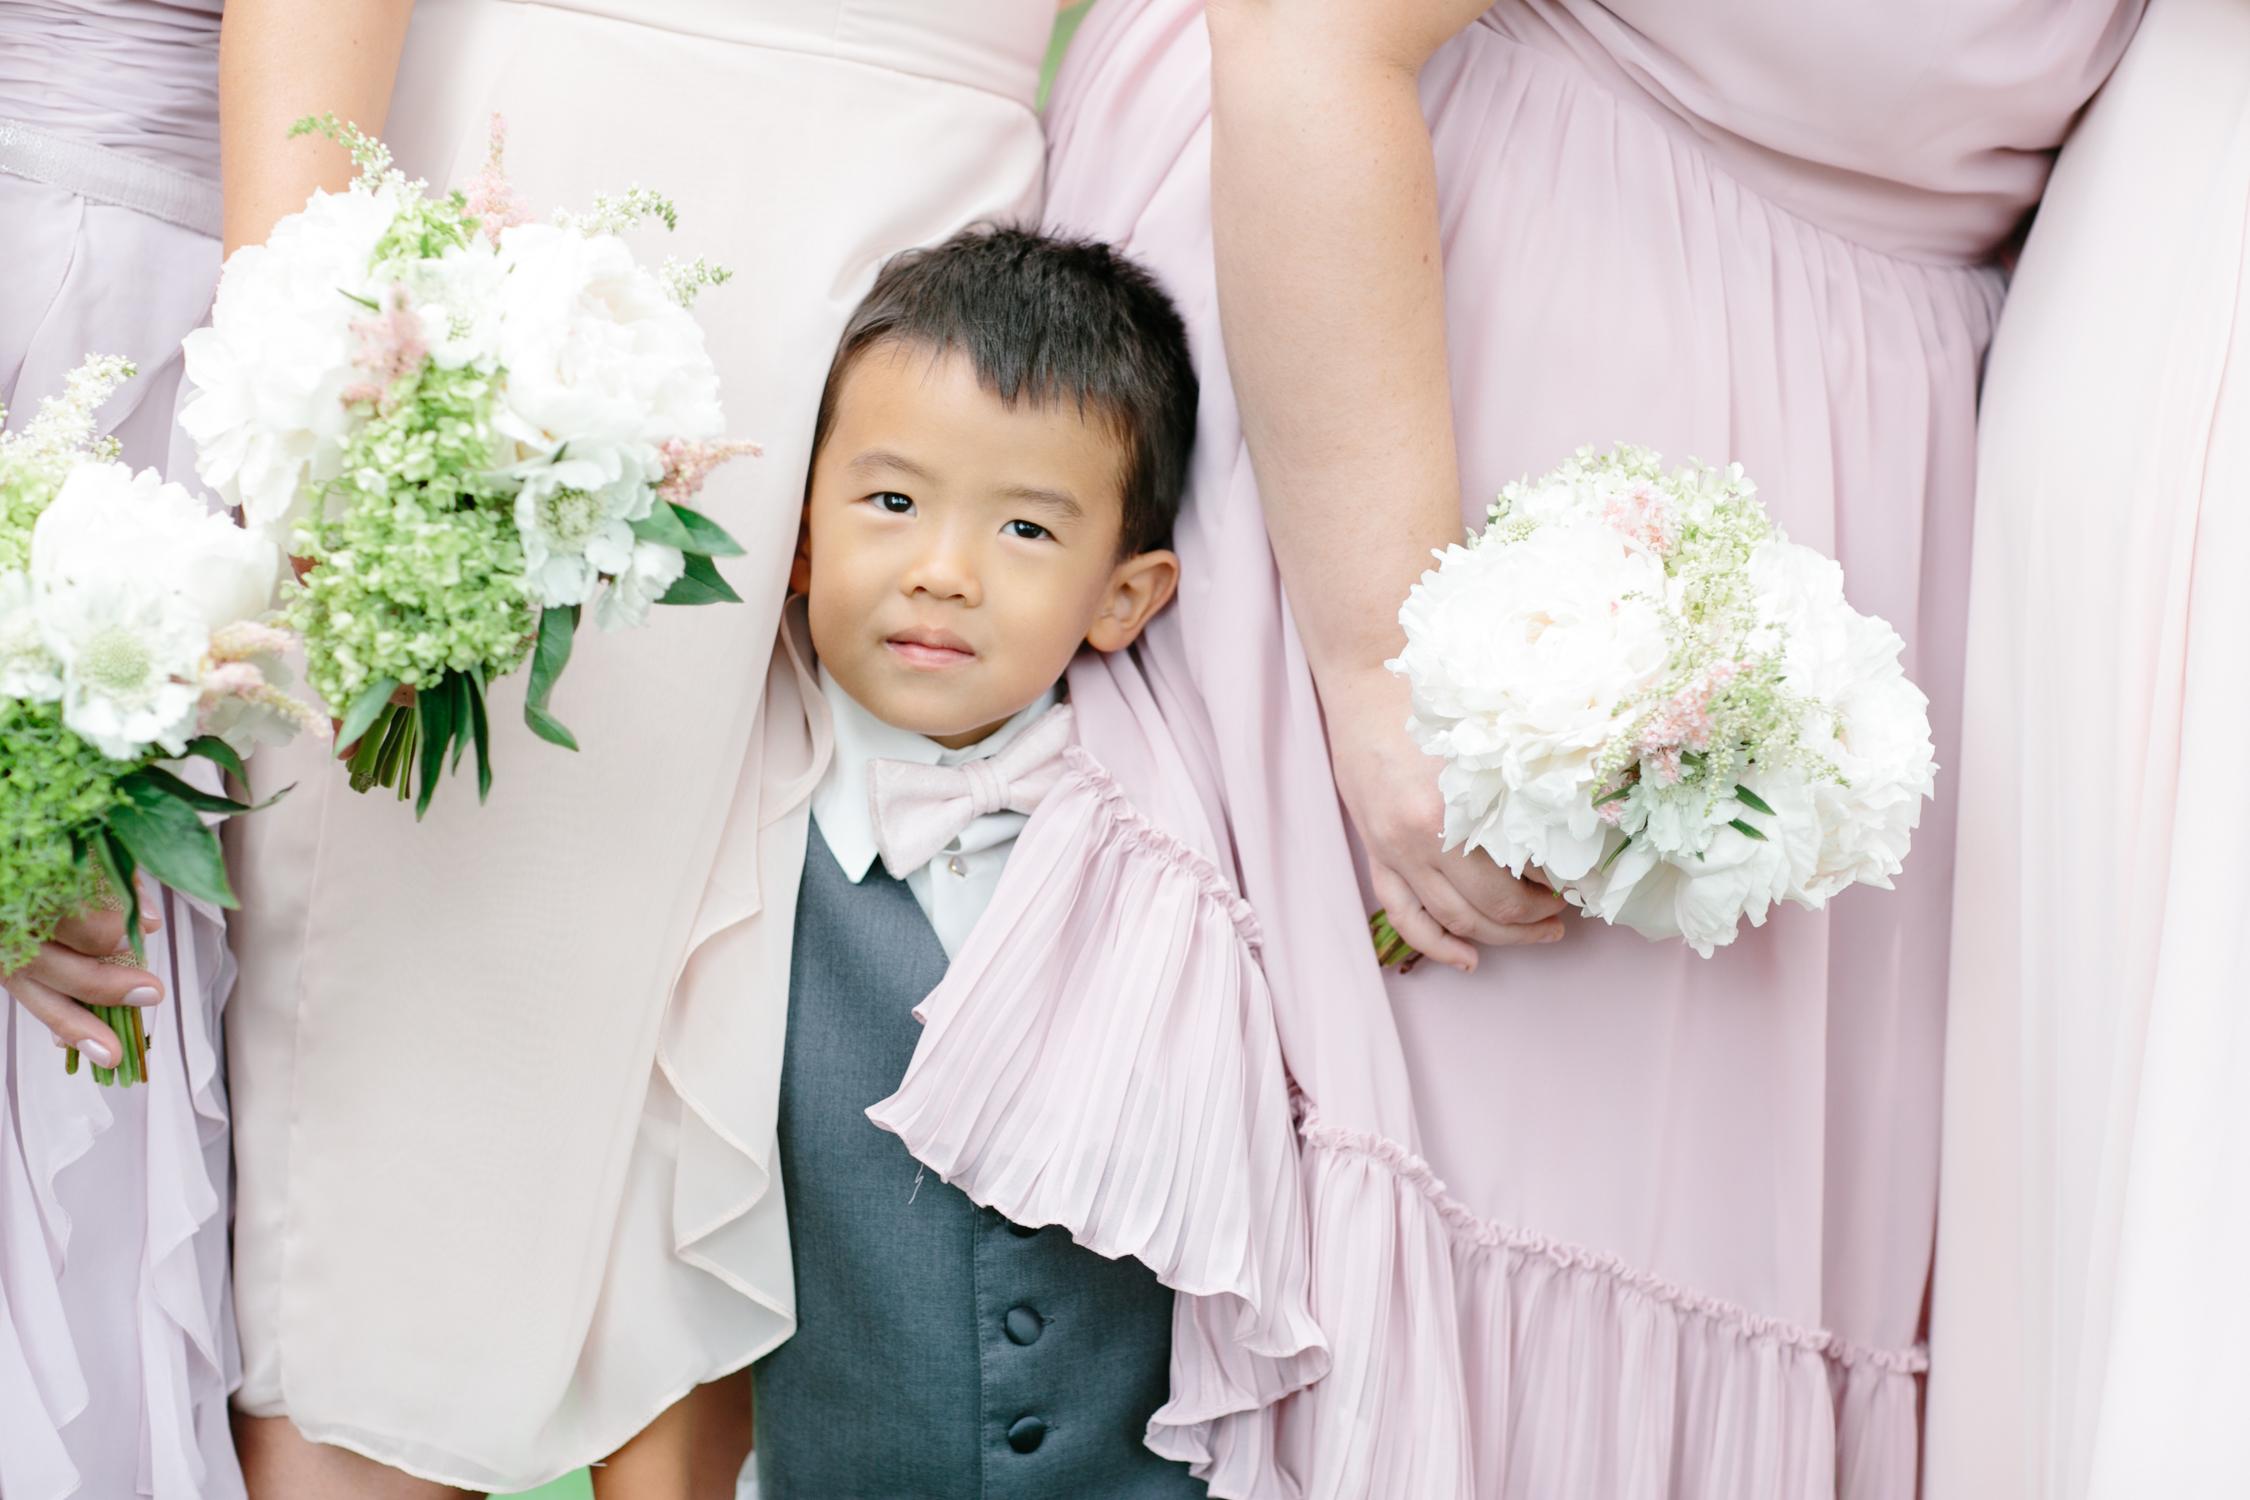 Postlewaits Oregon Wedding by Michelle Cross-29.jpg